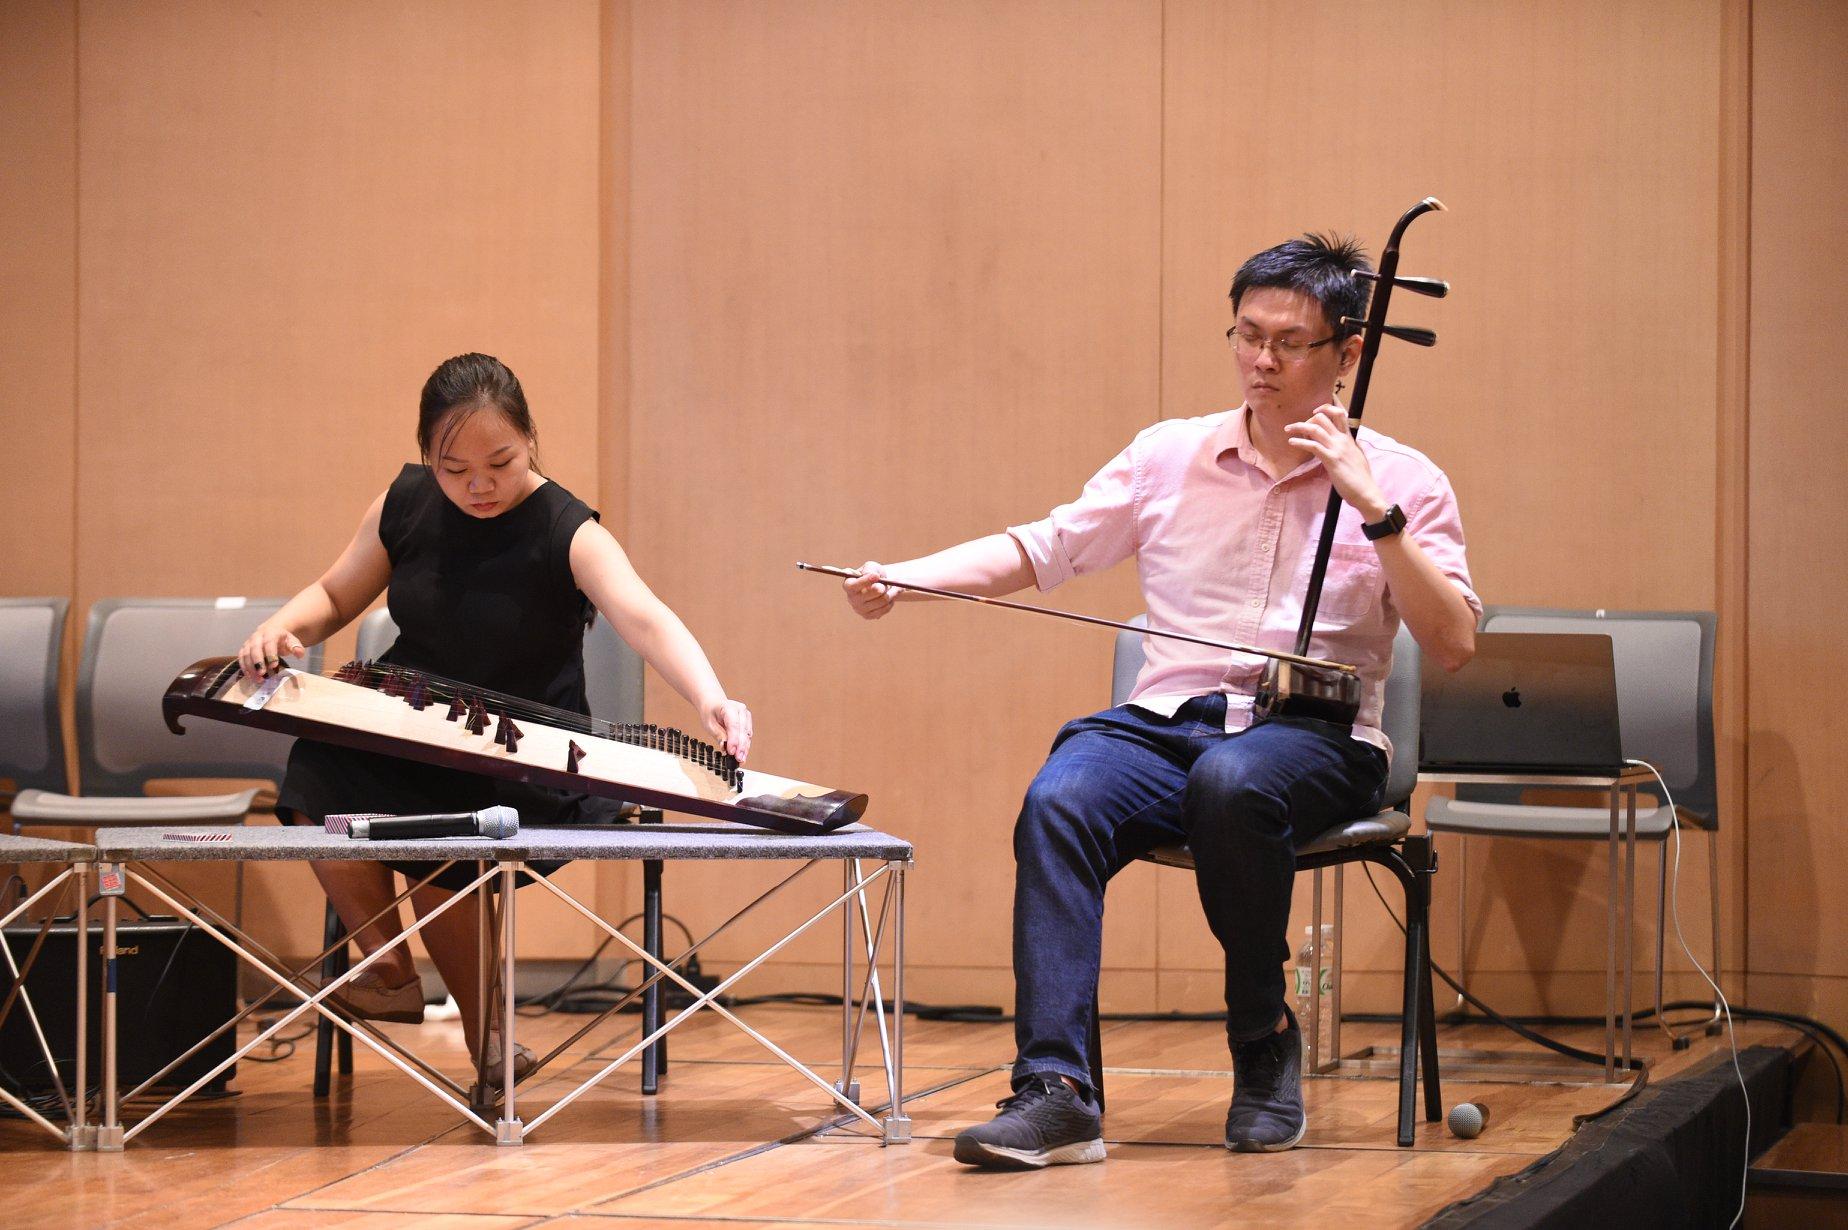 Jun Yan playing in a workshop.